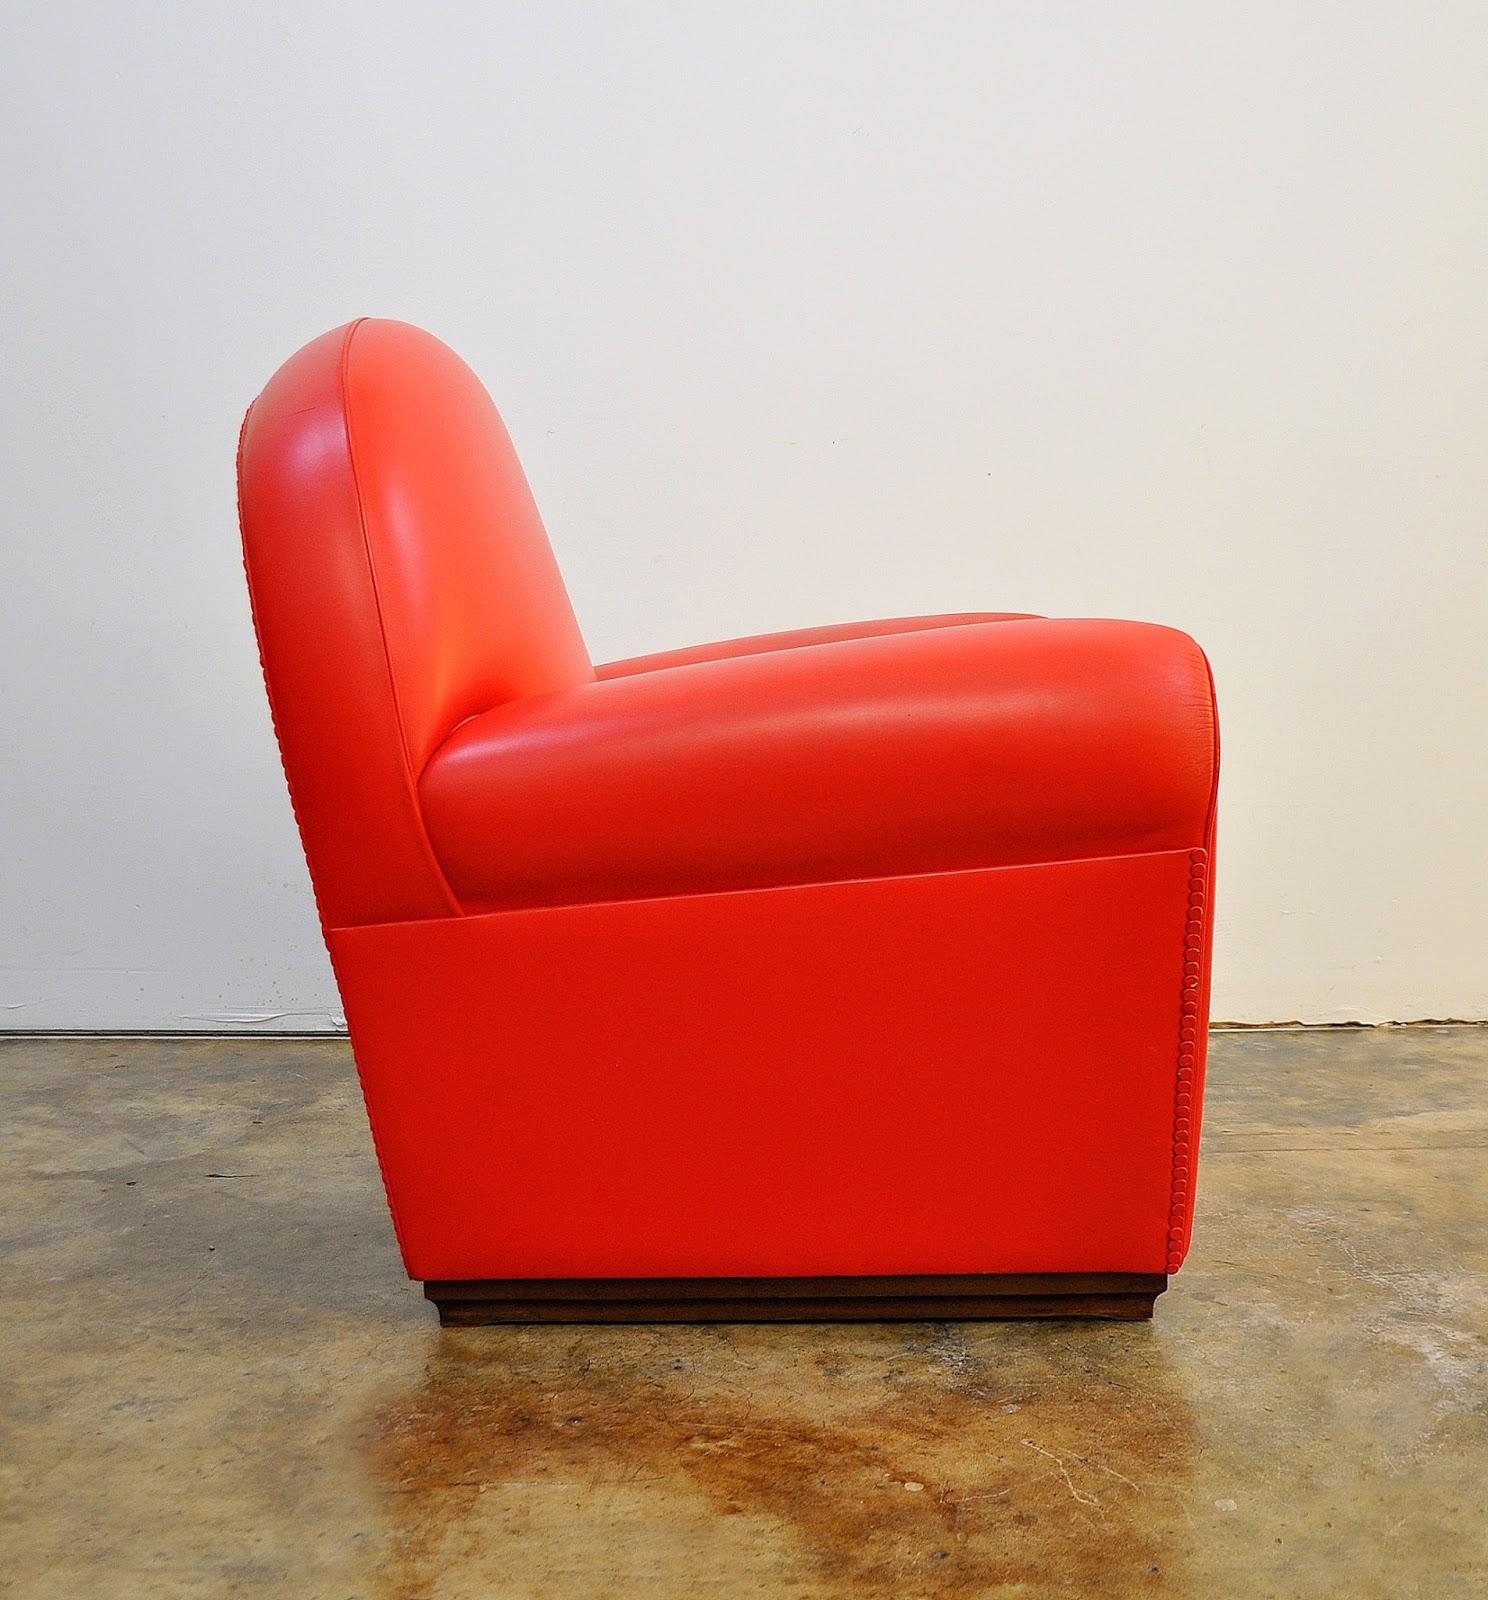 SELECT MODERN: Poltrona Frau Vanity Fair Leather Club Chair